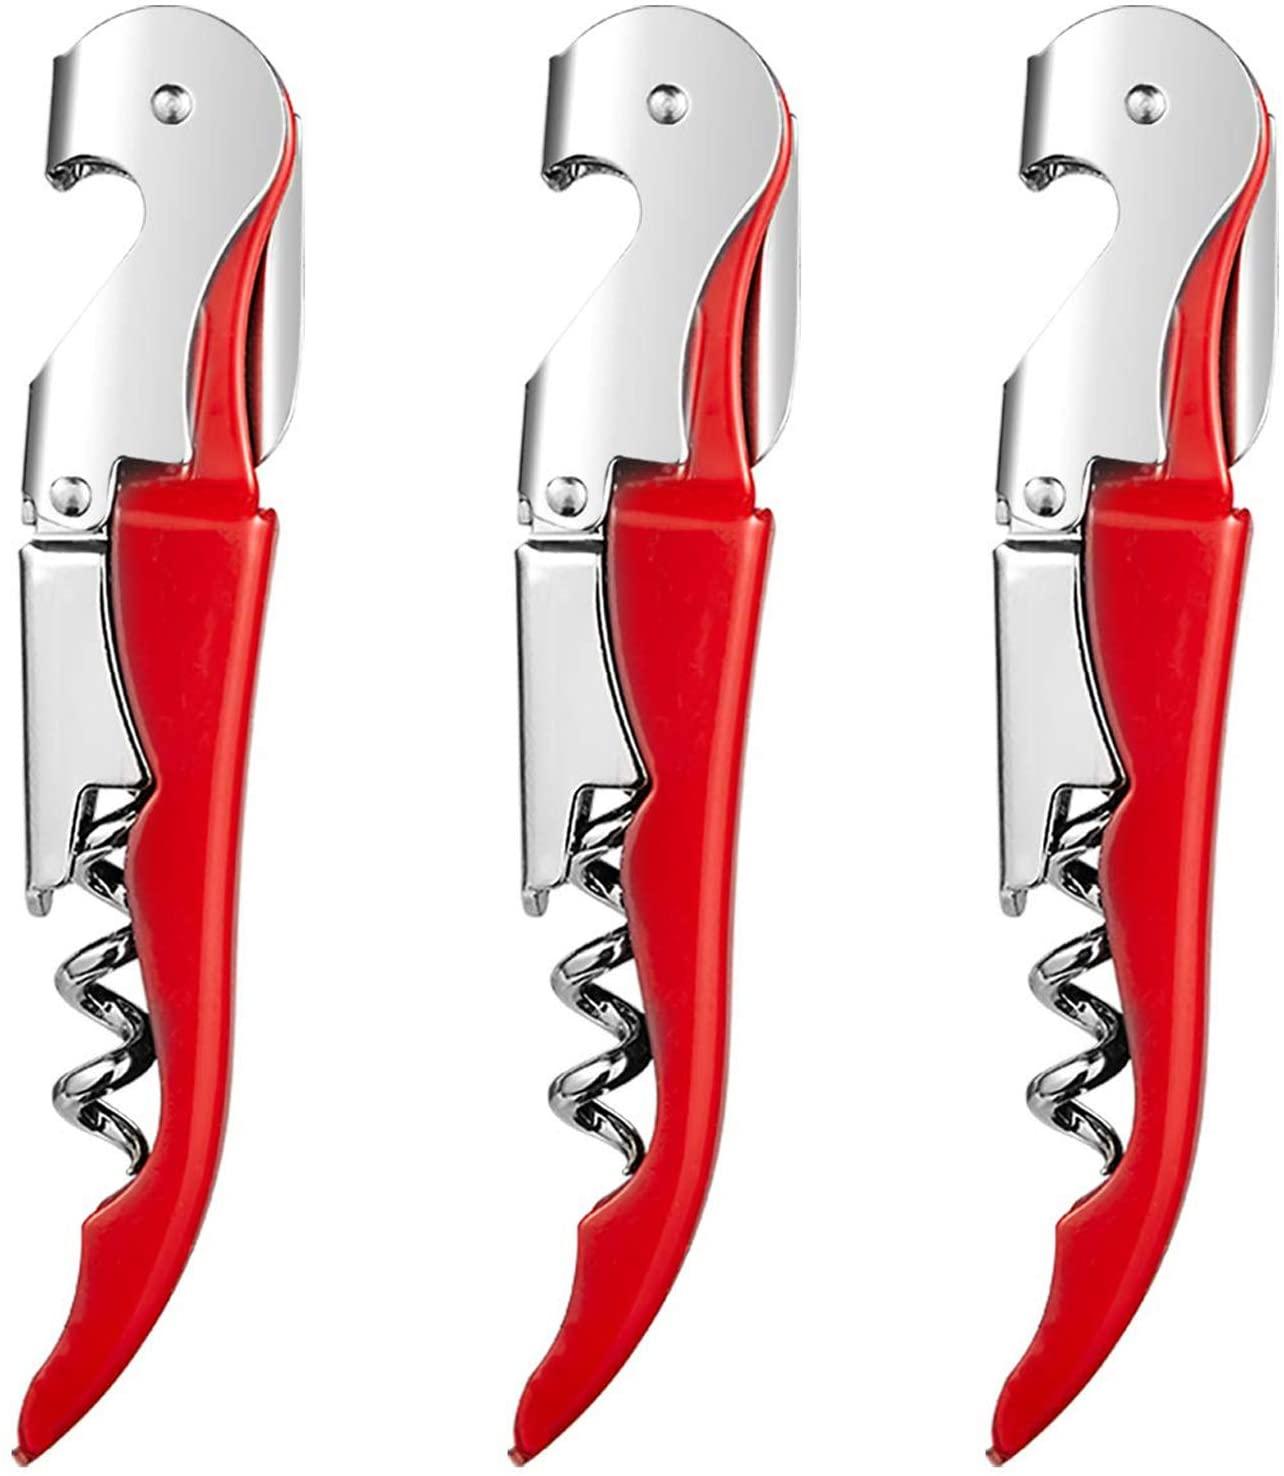 HYZ Waiter Corkscrew with Foil Cutter 3Pack, Double Hinged Wine Bottle Opener Set, High-End Wine Key for Bartender Server Waiter, Stainless Steel Heavy Duty Waiter's Corkscrew - Red